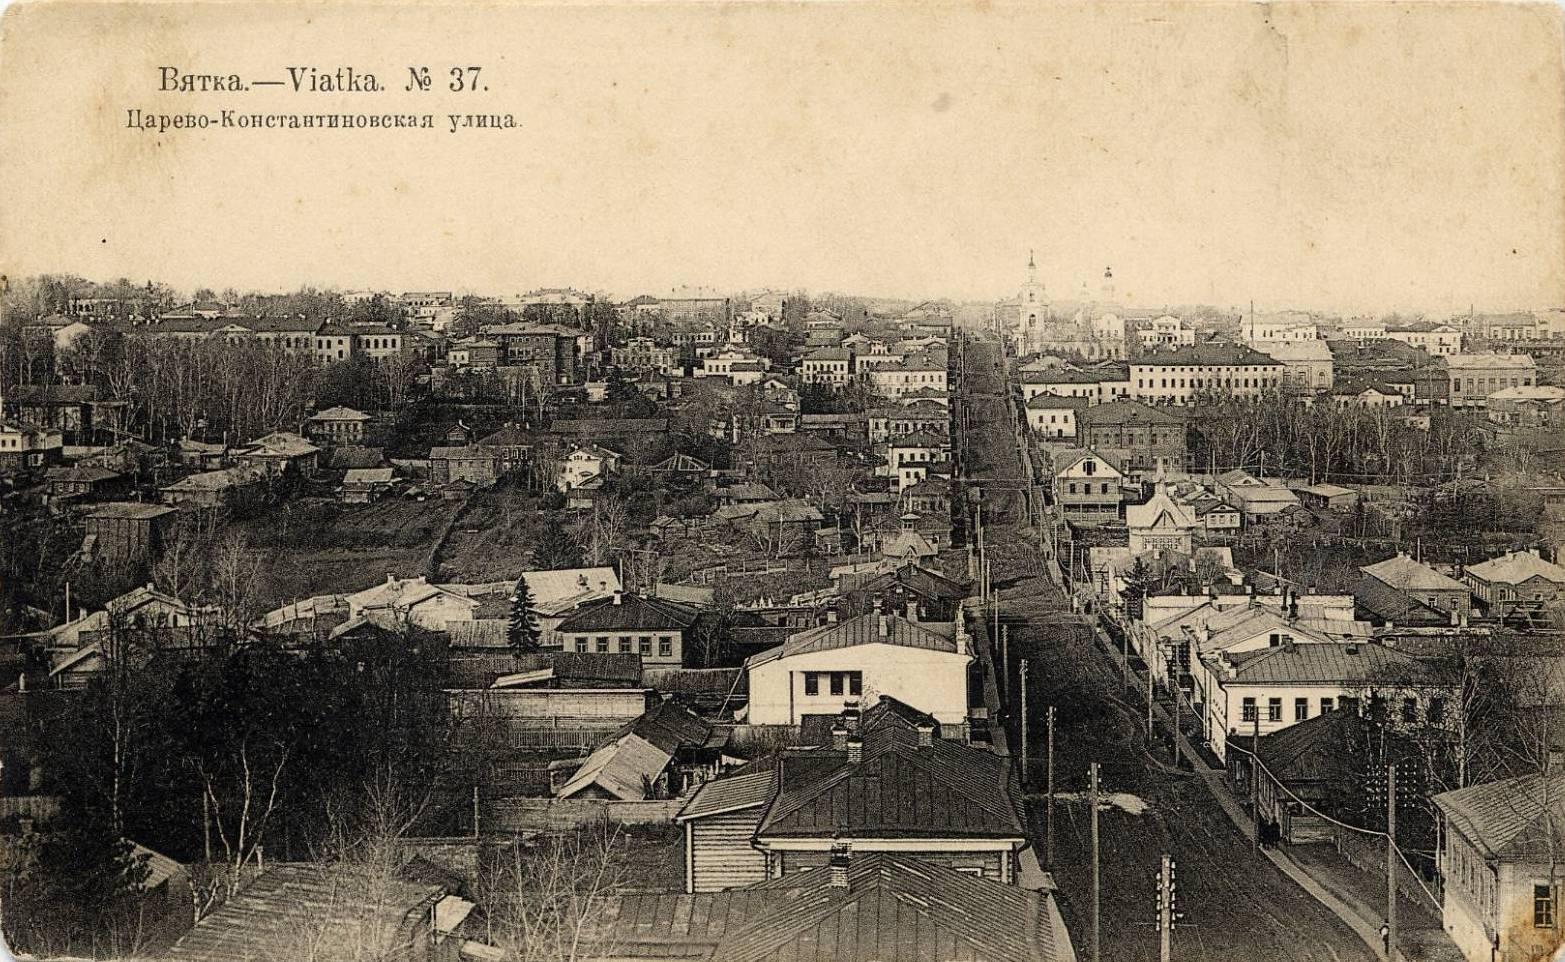 Царево-Константиновская улица